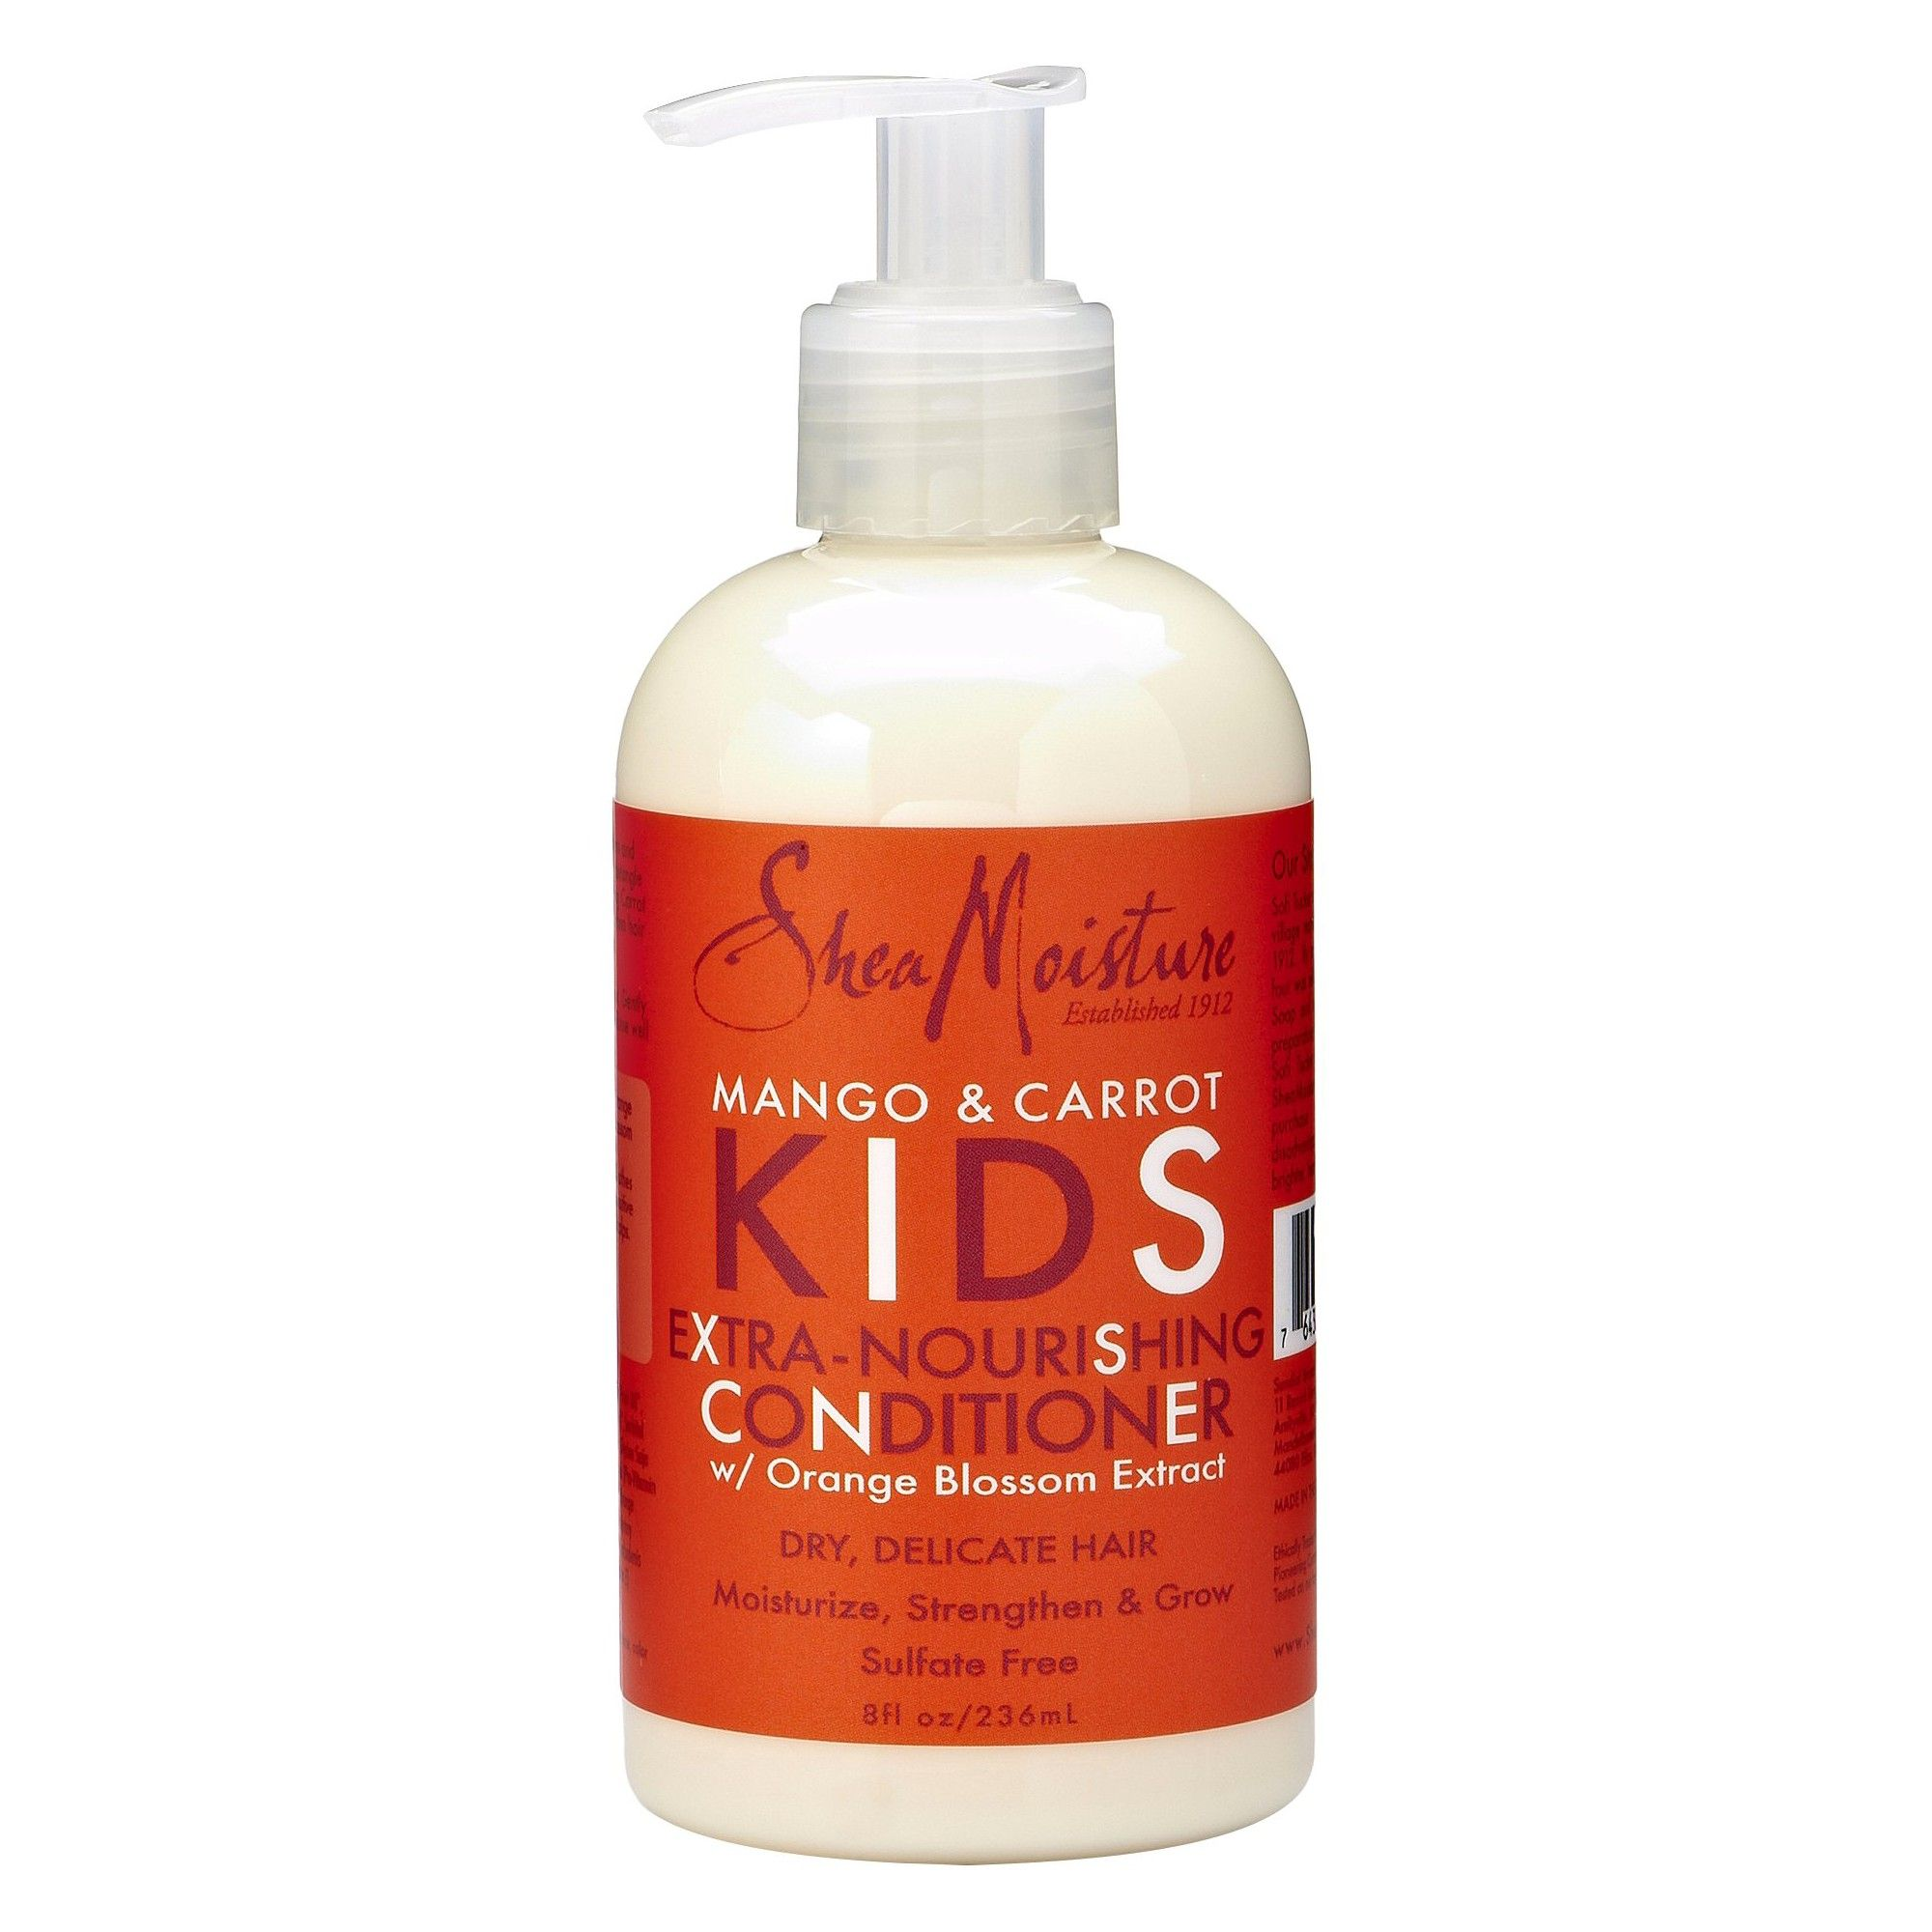 SheaMoisture Mango & Carrot Kids ExtraNourishing